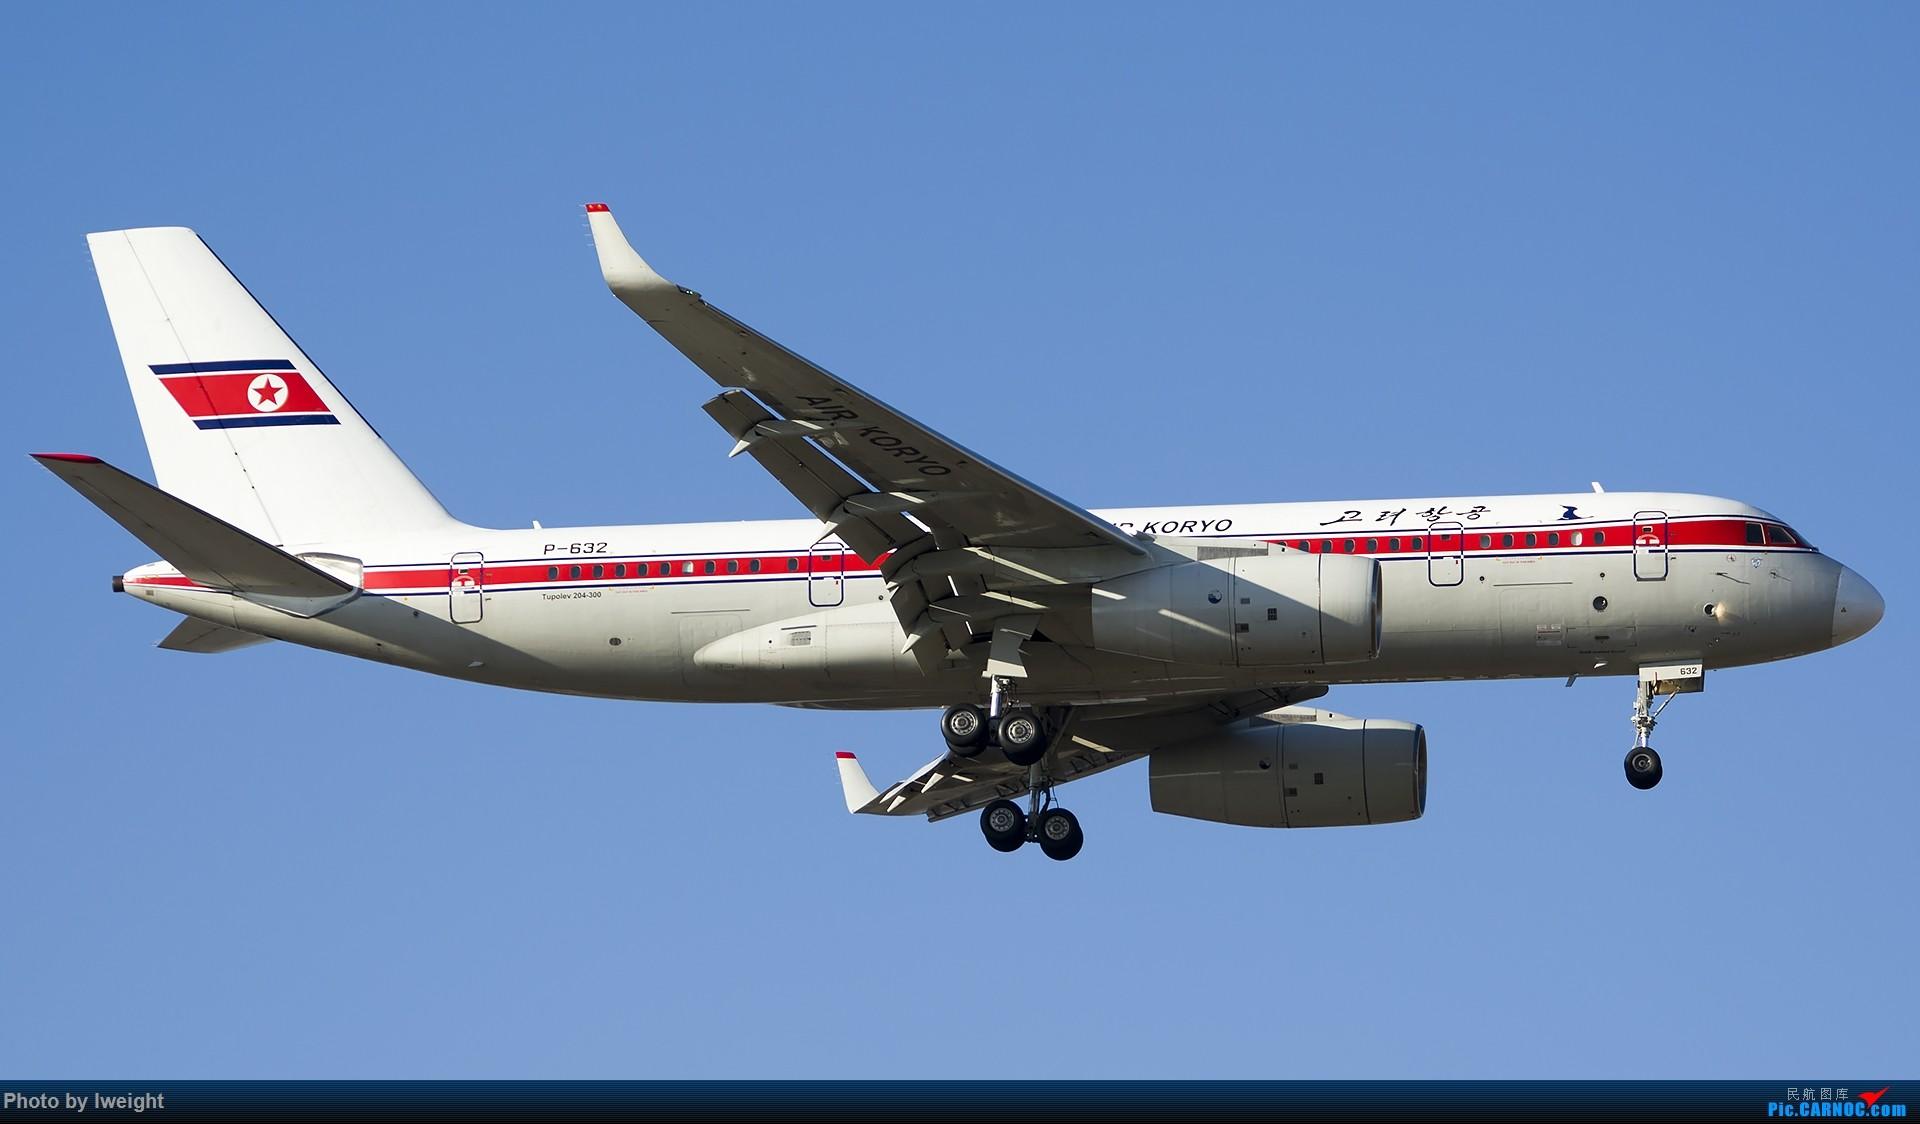 Re:[原创]2014-12-06 PEK天气由好变坏的直接体验 TUPOLEV TU-204-300 P-632 中国北京首都国际机场